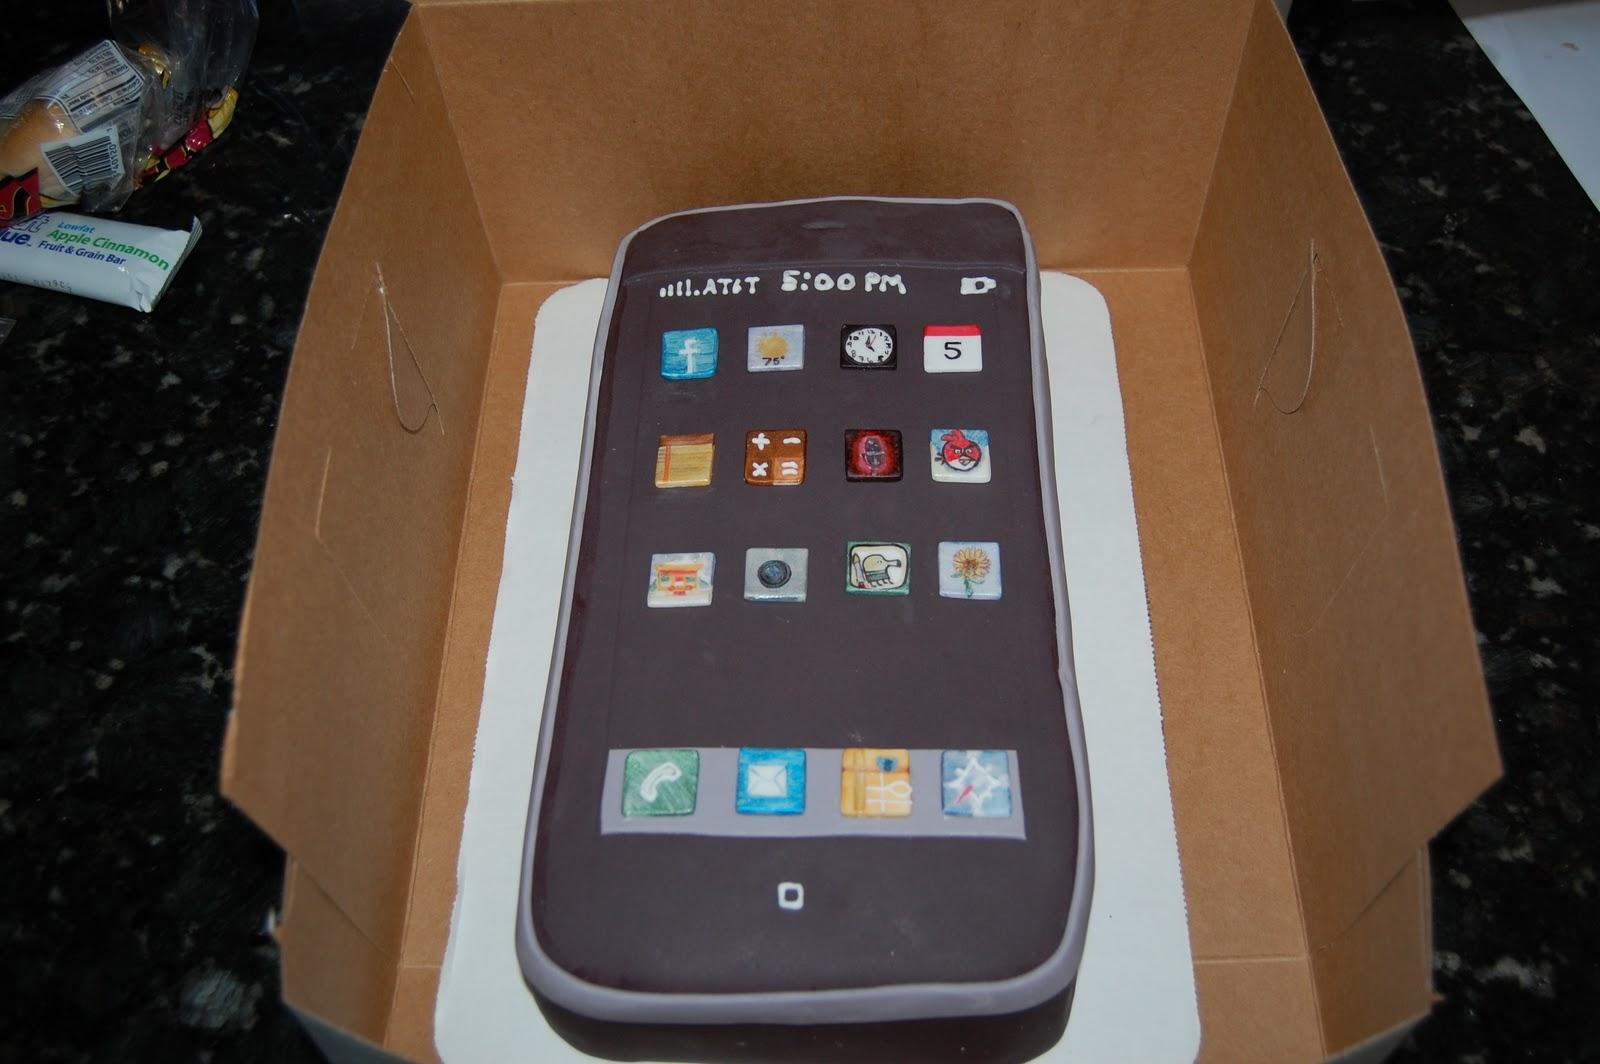 http://1.bp.blogspot.com/_2-Wg7YTdBco/TIFus4bY9KI/AAAAAAAAAc4/LC26Kr8PQHQ/s1600/iphone_cake.JPG